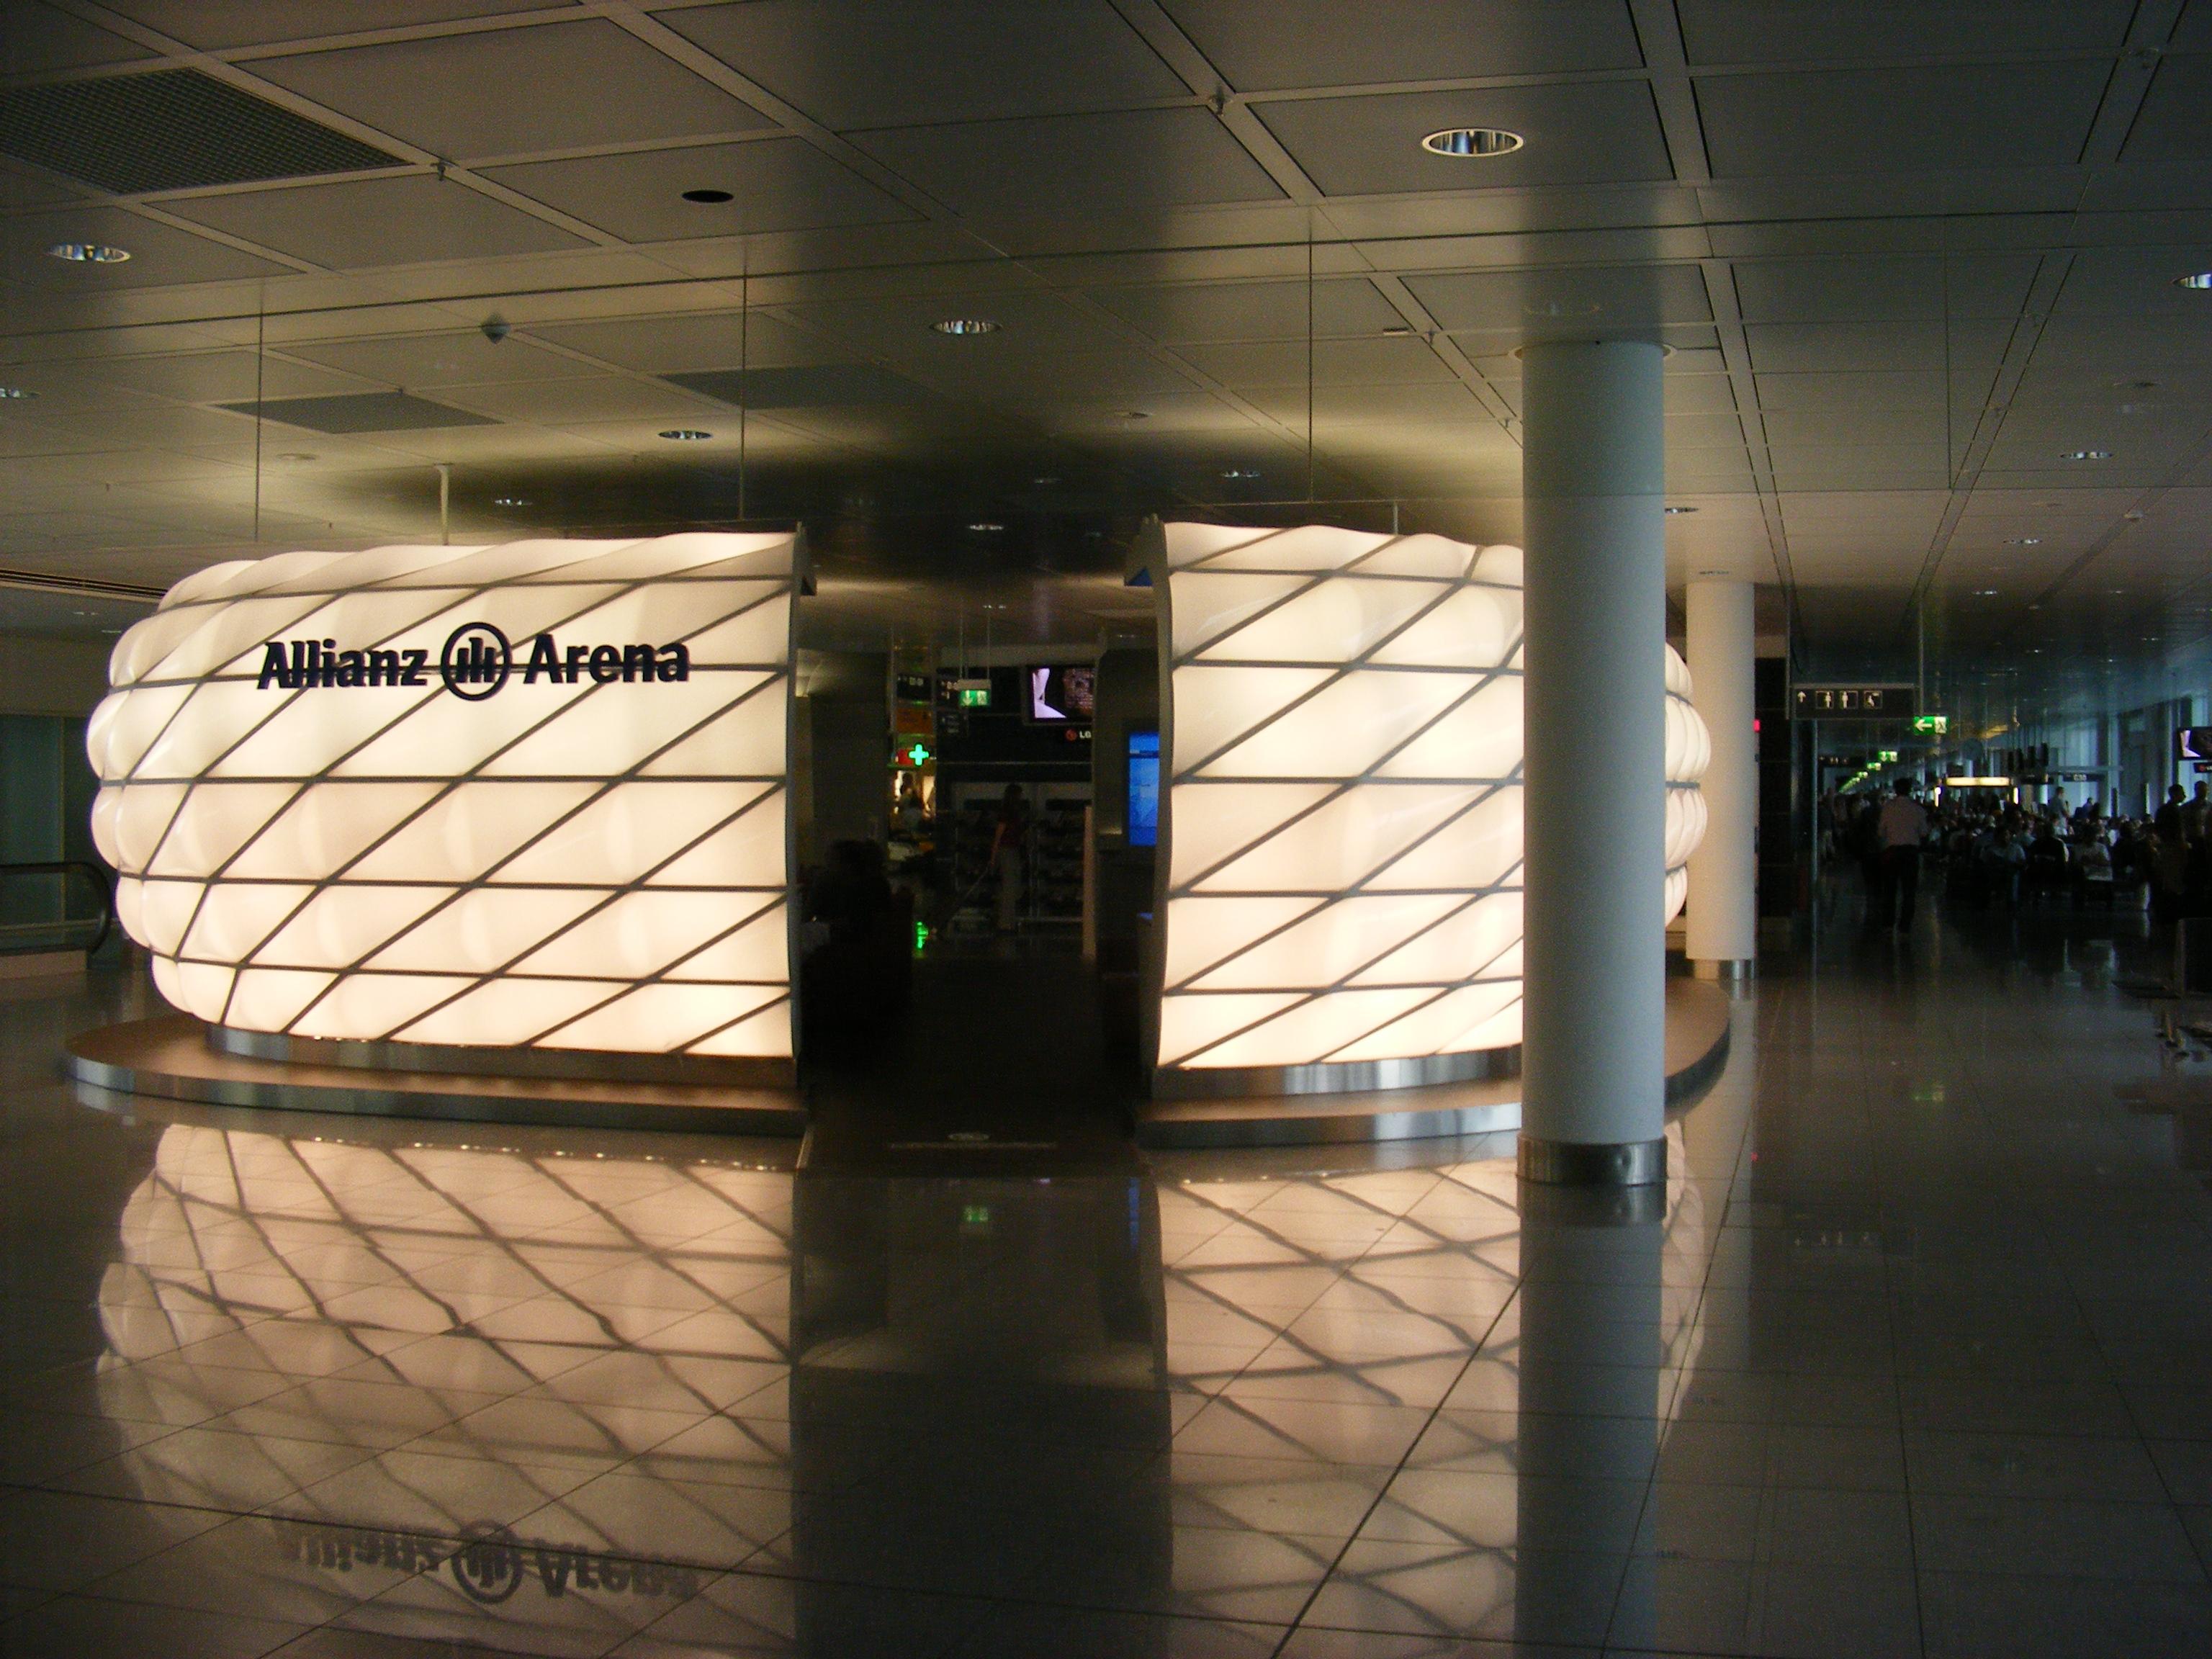 Fileallianz Arena Model At Munich Airportjpg Wikimedia